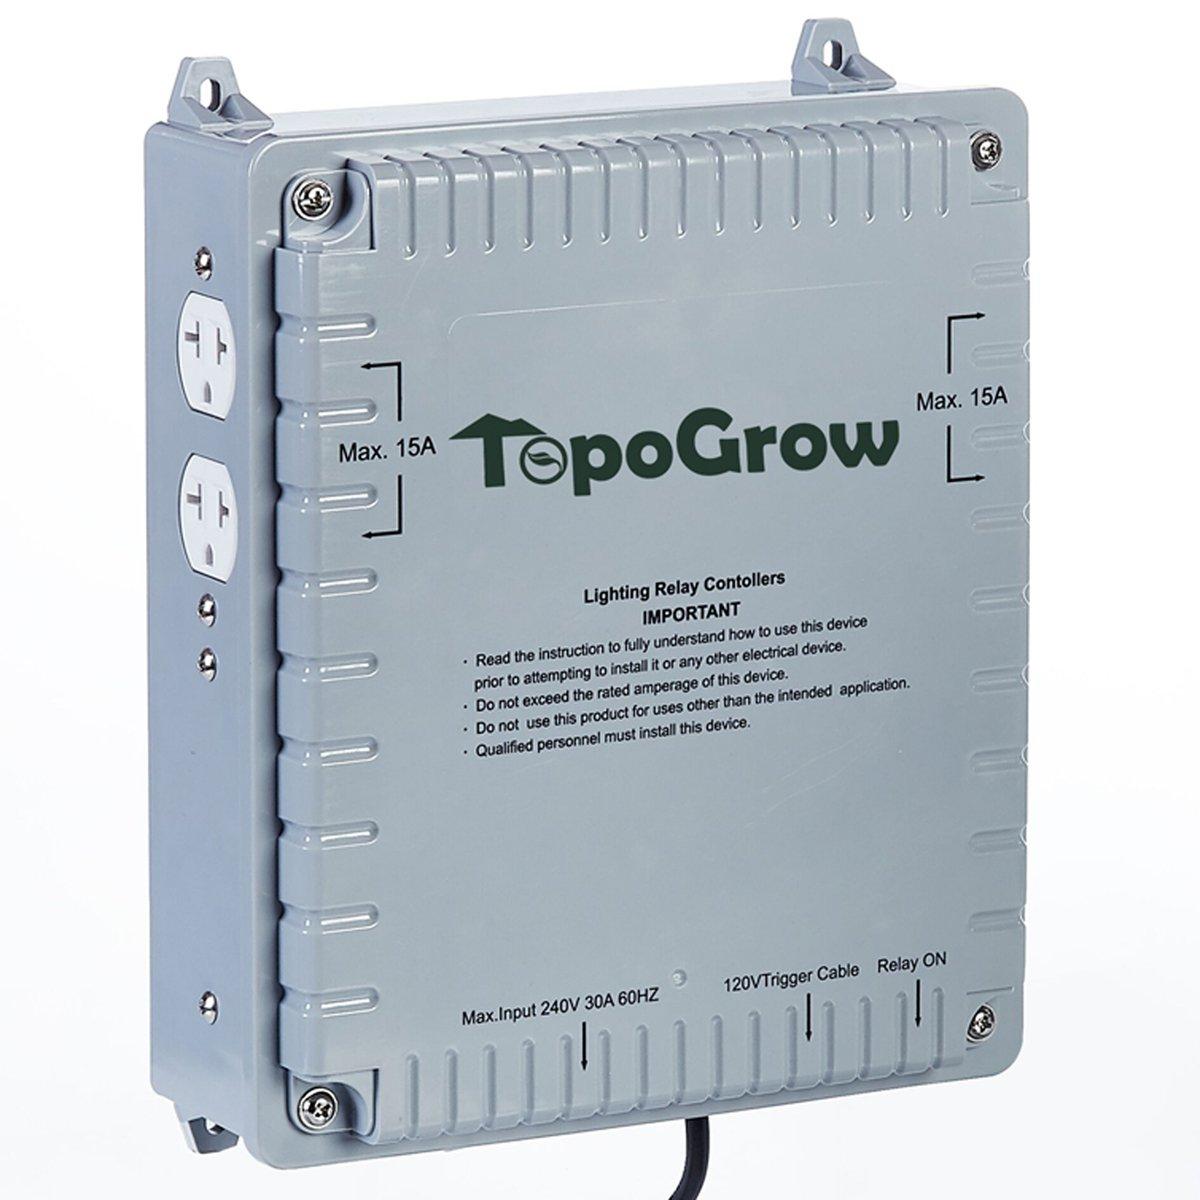 TopoLite Light Controller Bonsai Shears Grow Light Hangers Fan Speed Controller Timer CO2 Regulator Hydroponics Growing System Accessories (Light Controller 4 Outlet)